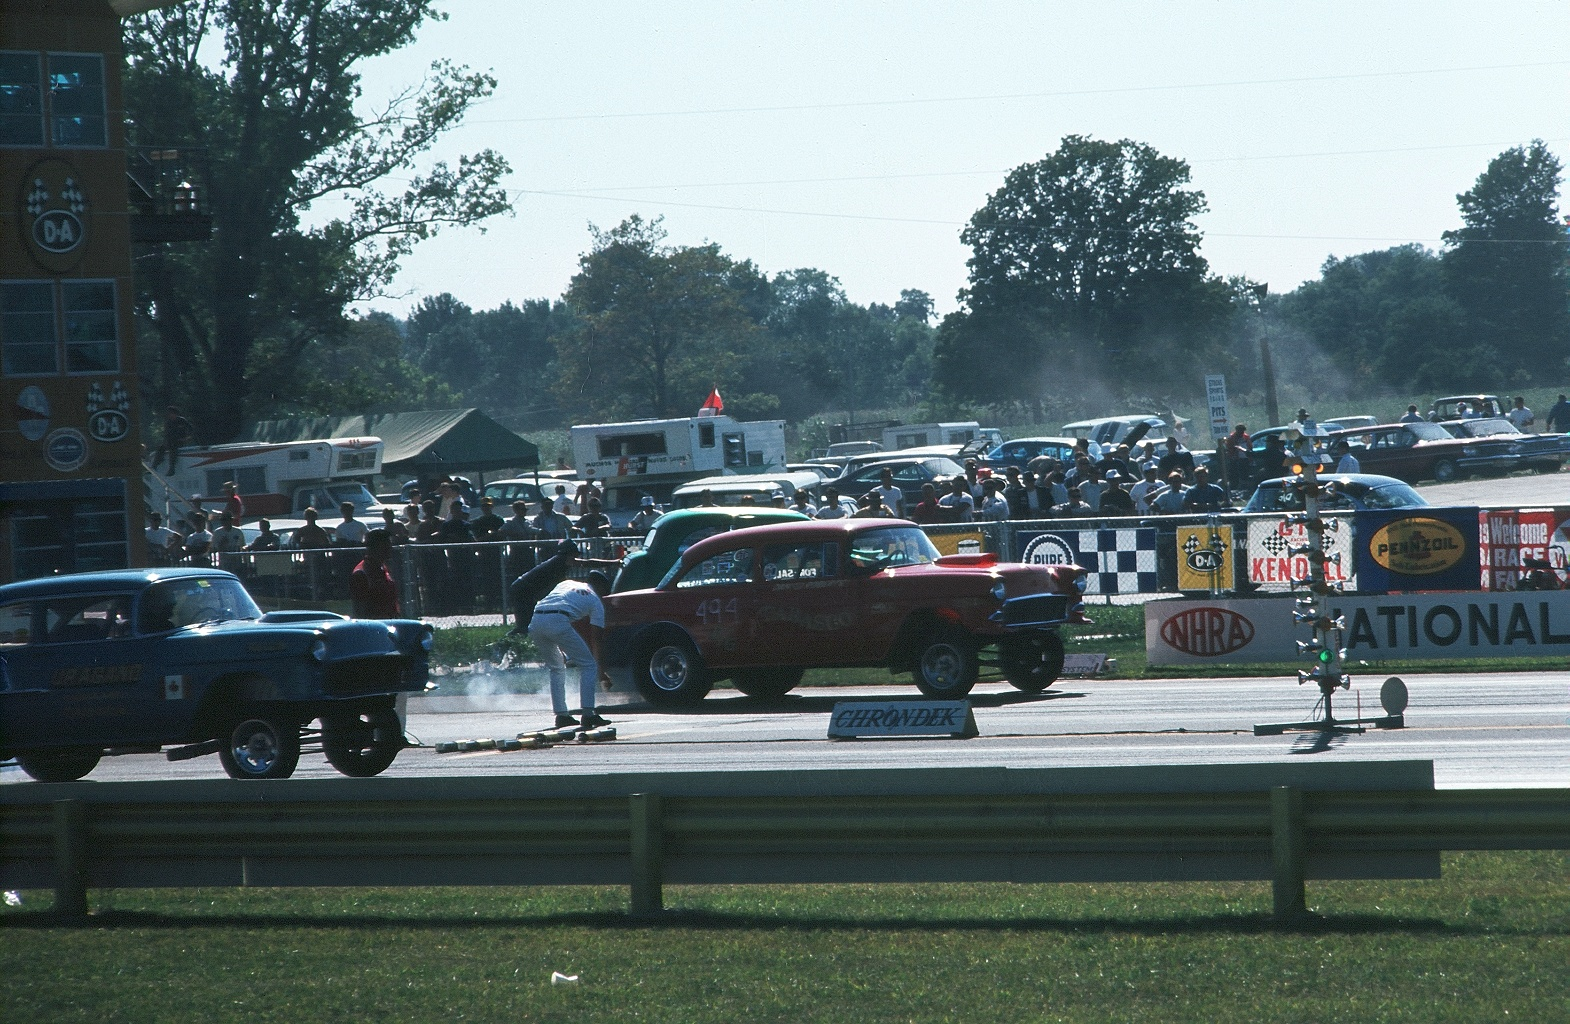 macs cars Picture 324.jpg